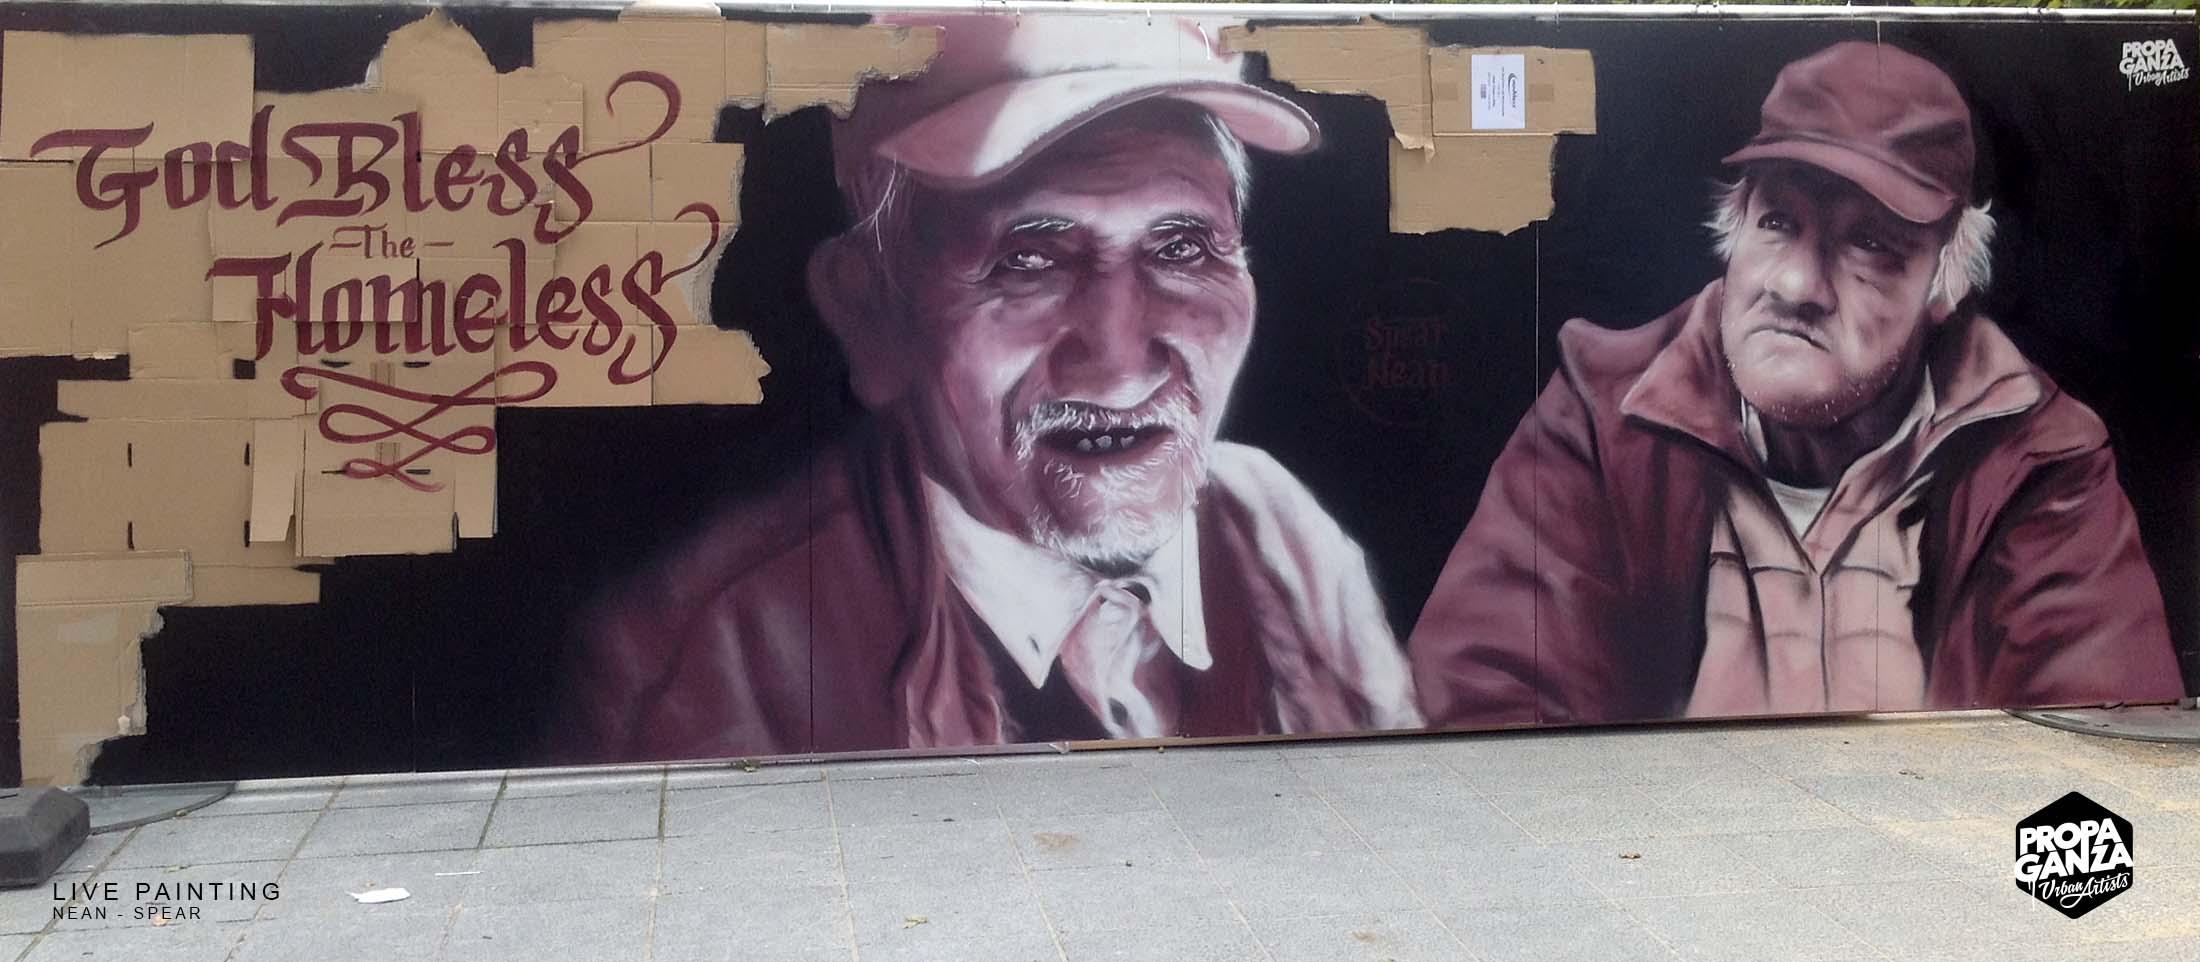 https://www.propaganza.be/wp-content/uploads/2019/04/propaganza-brussels-bruxelles-spear-nean-graffiti-plastic-live-painting-graffiti-street-art-homeless-3.jpg